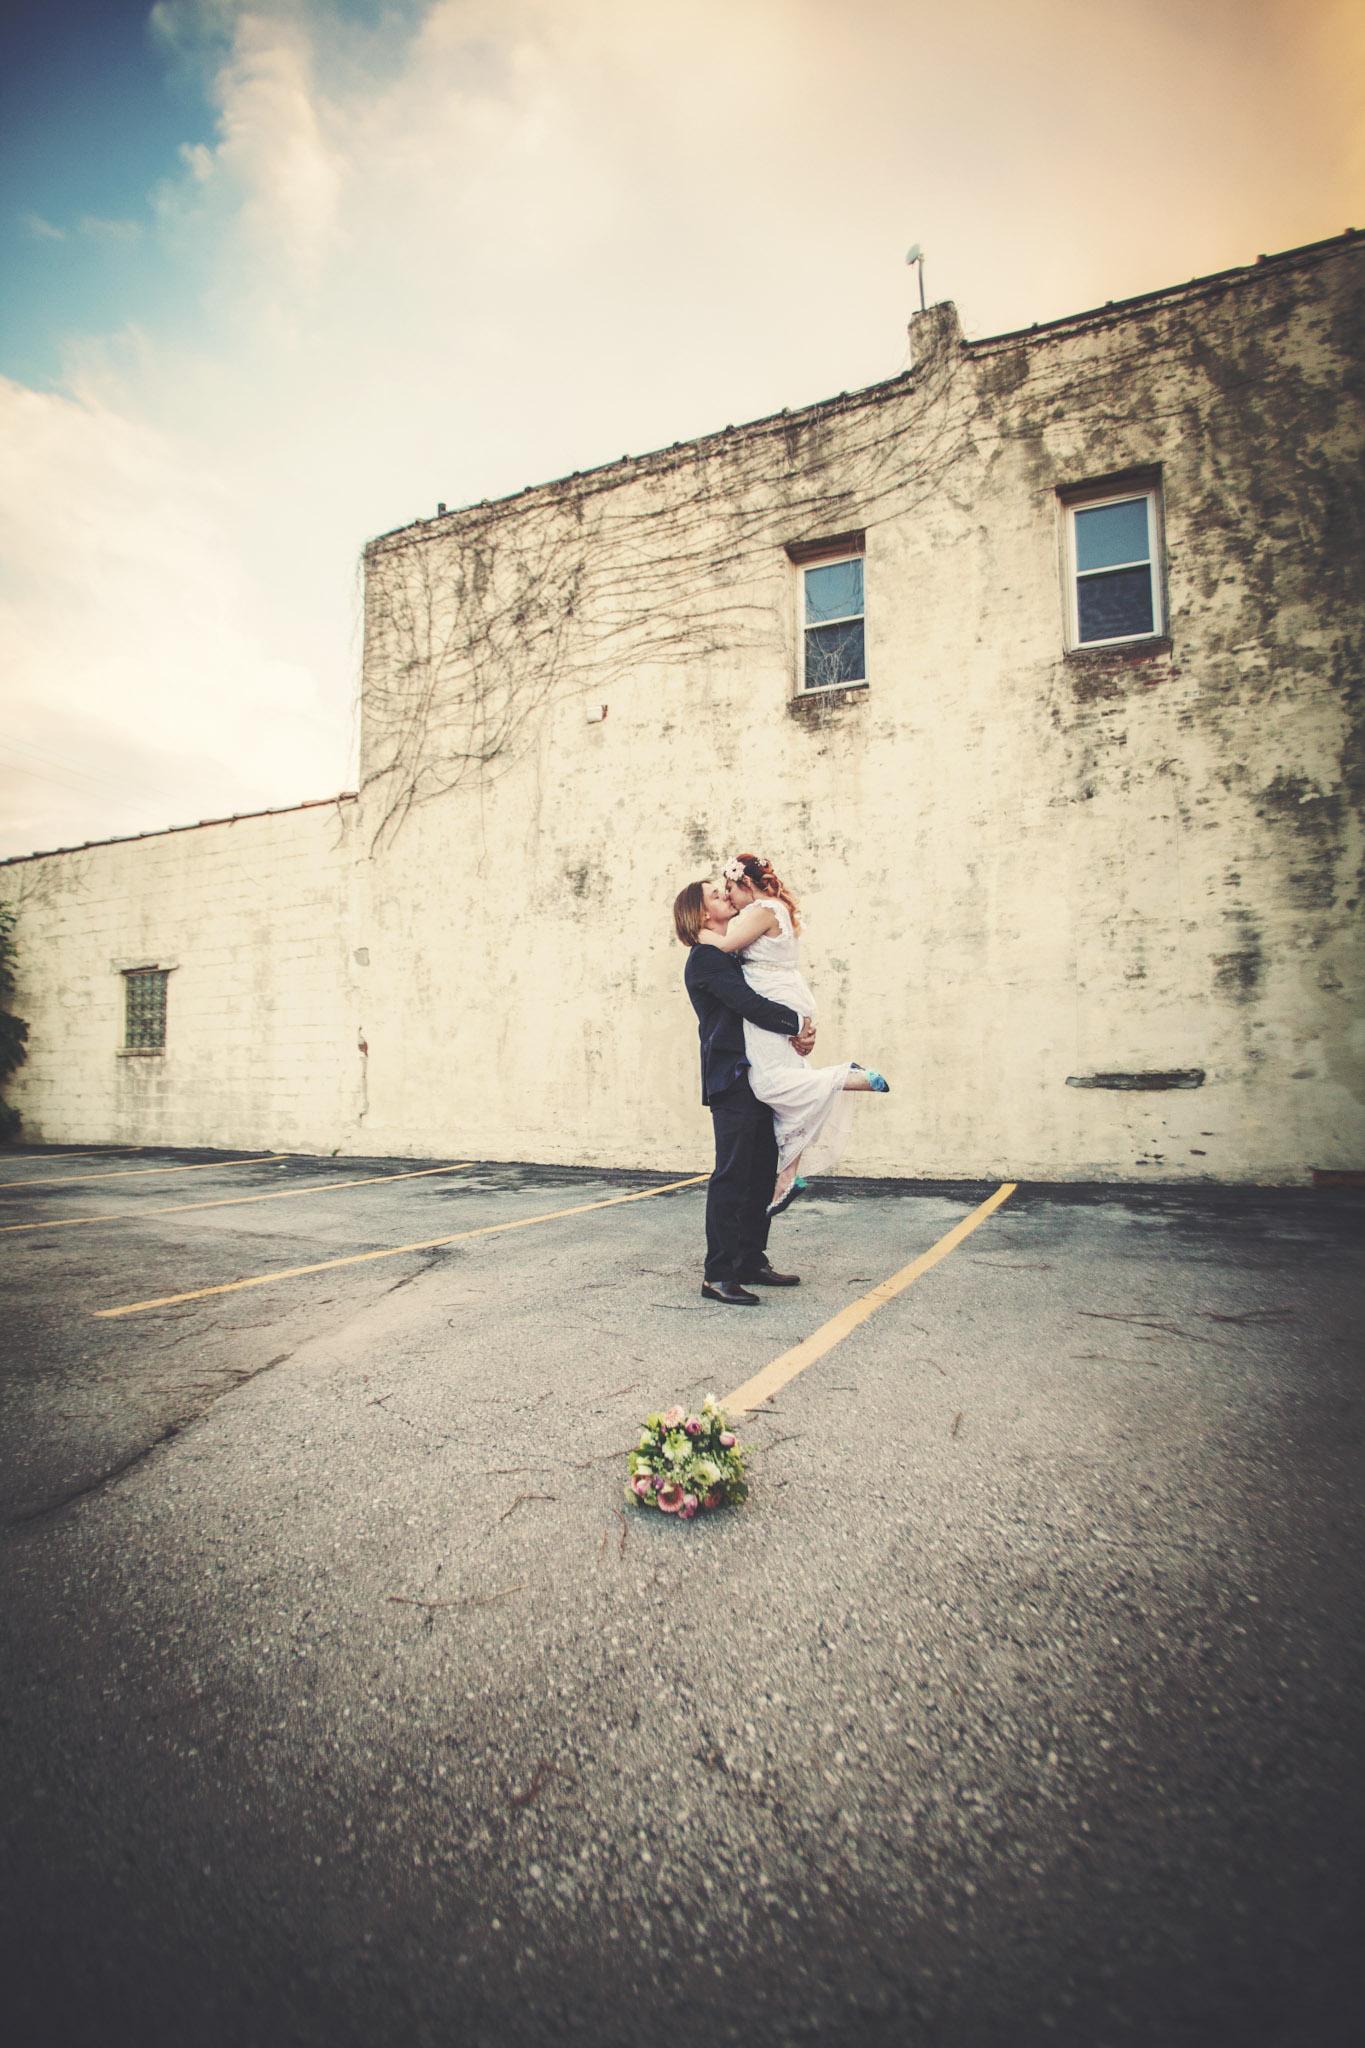 Kansas_City_Small_Wedding_Venue_Elope_Intimate_Ceremony_Budget_Affordable_Sophie&Philip_243b.jpg